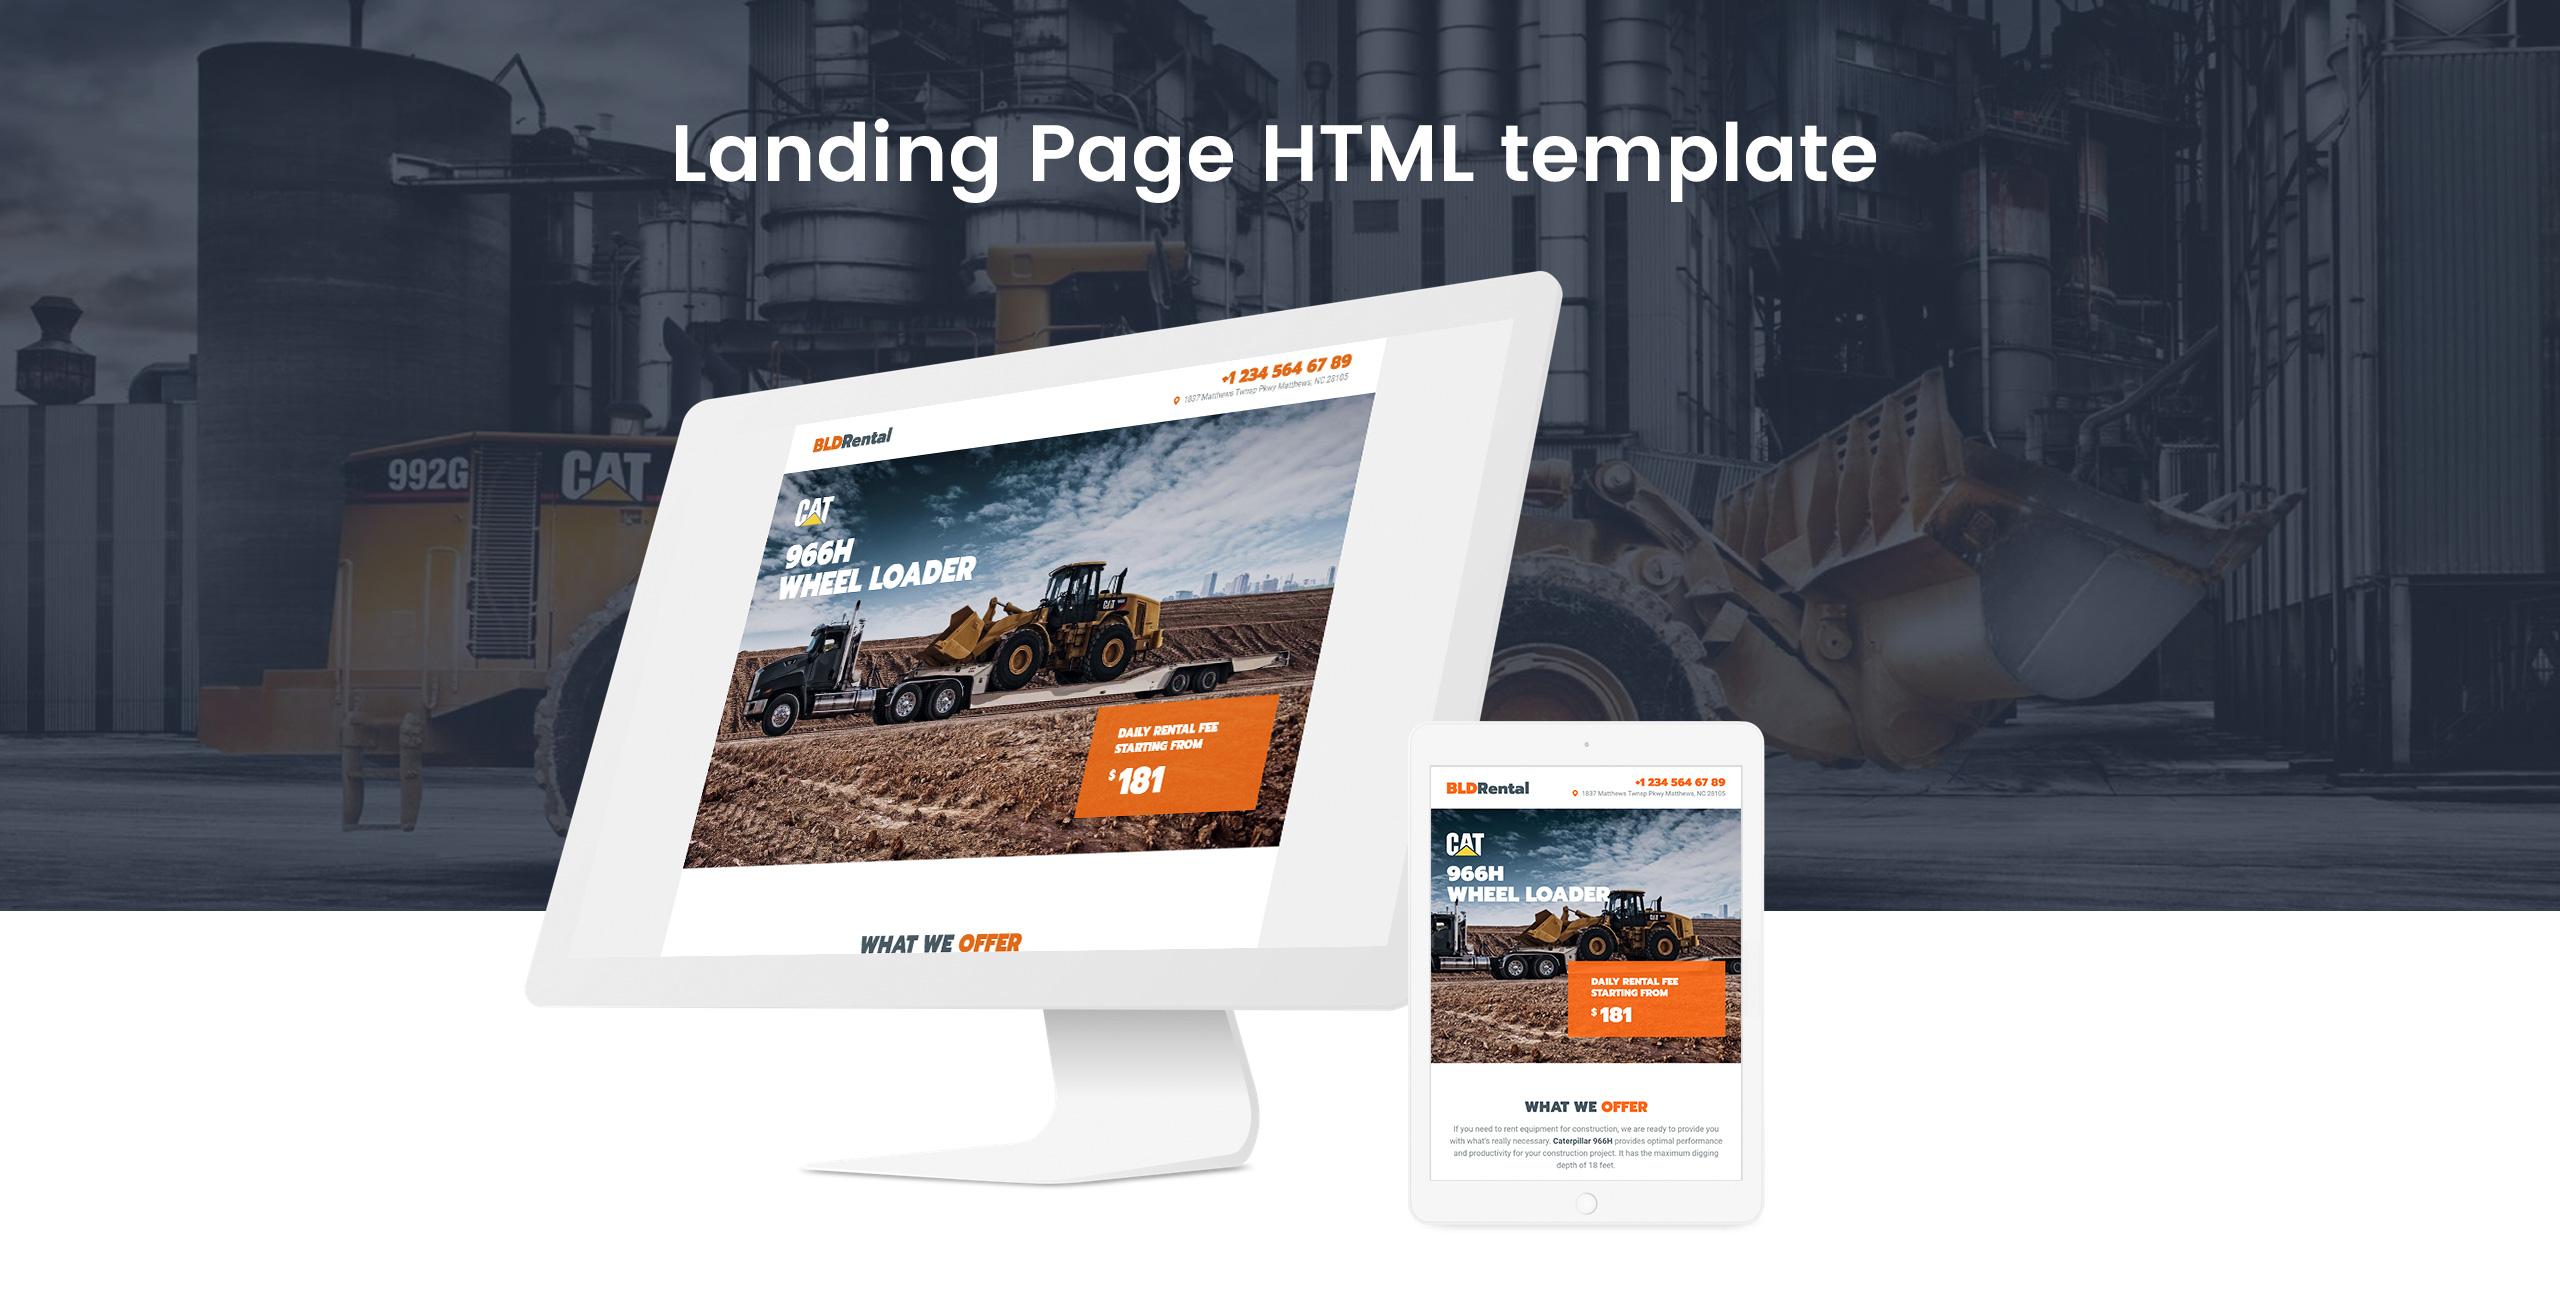 BLDRental - Equipment Rental Landing Page Template